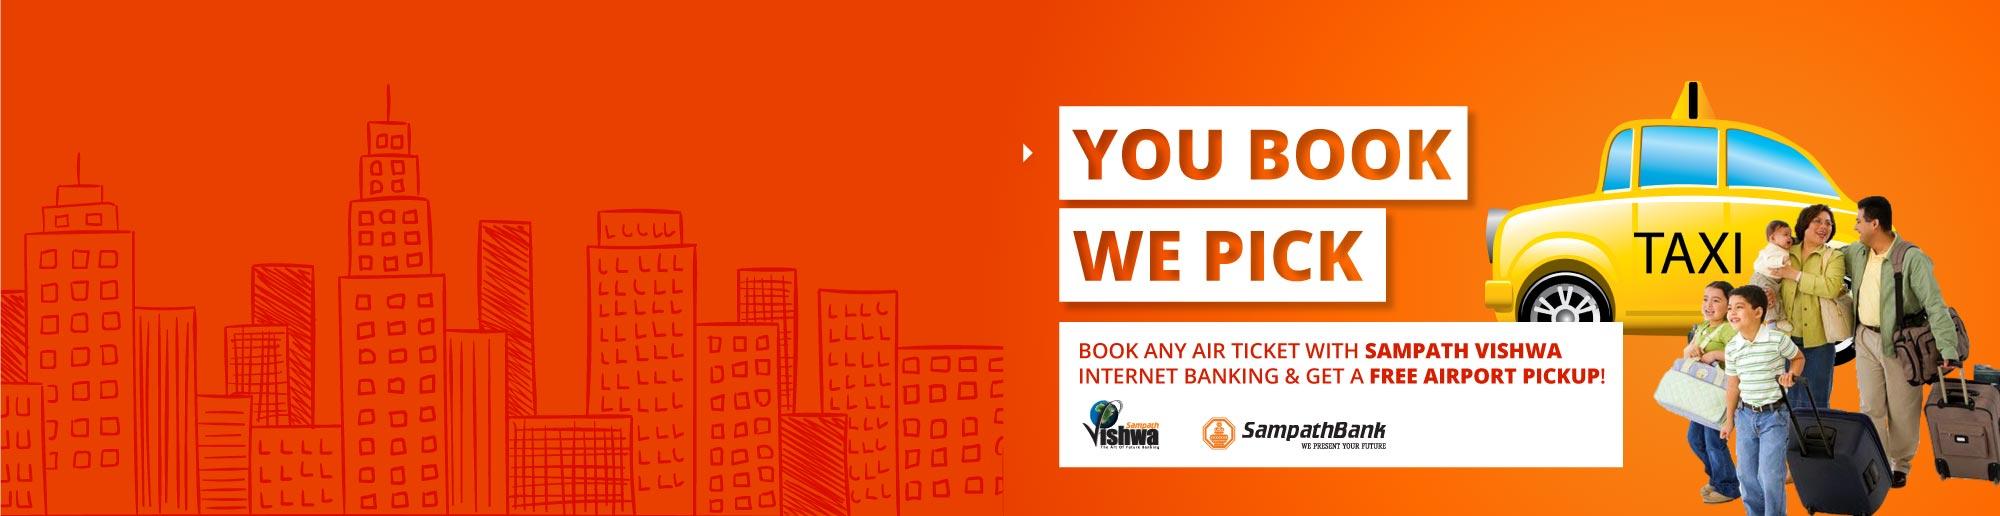 Book Any Air Ticket Through Sampath Vishwa Internet Banking And Get A FREE Airport Pickup!